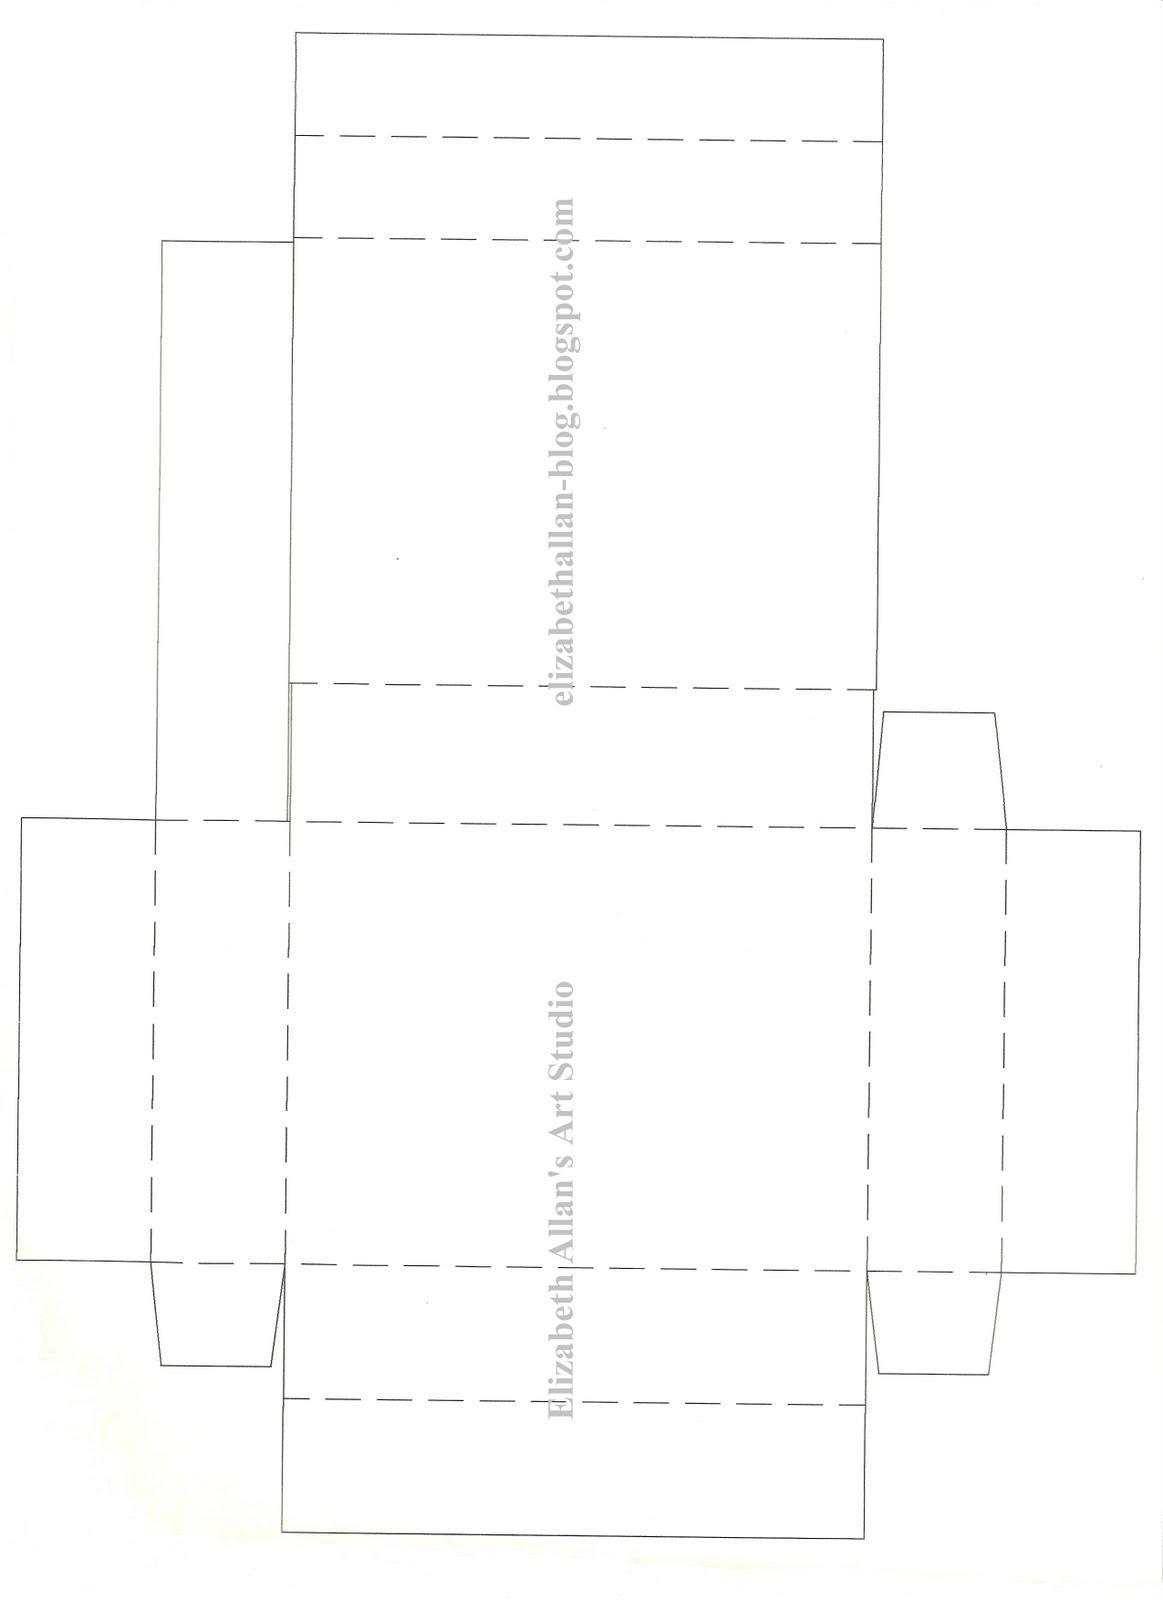 elizabeth allan u0026 39 s art studio  templates